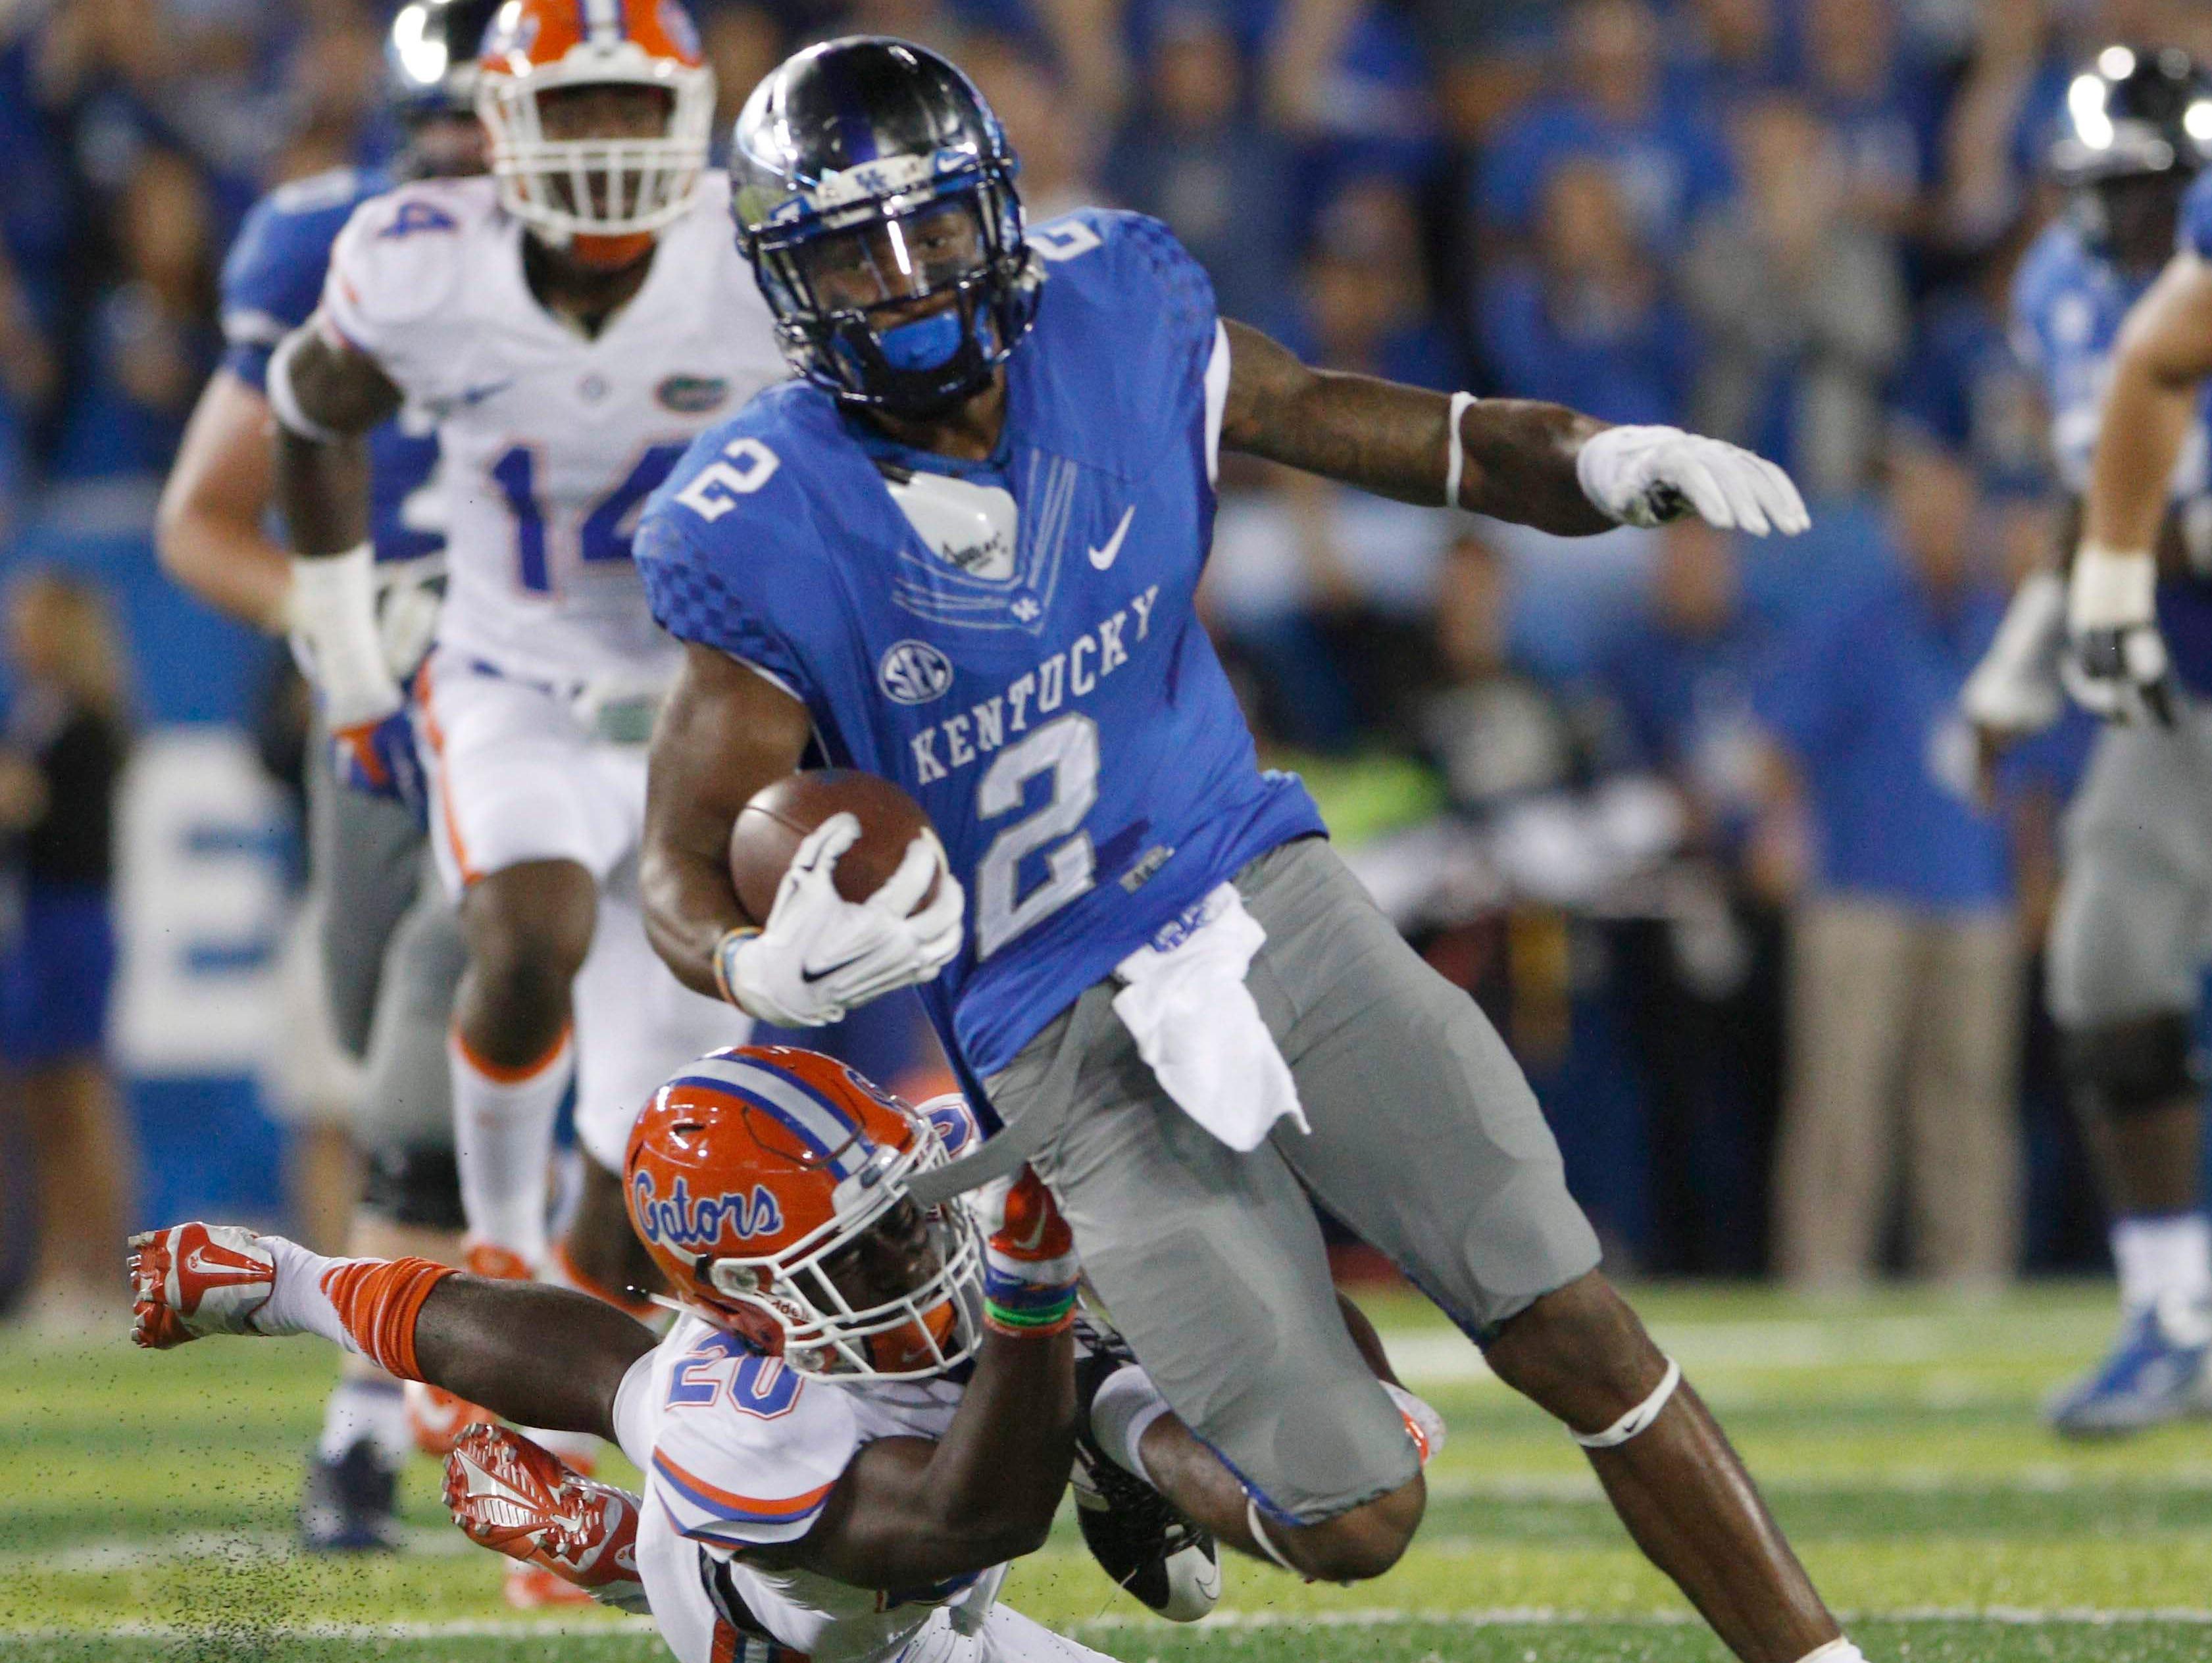 Sep 19, 2015; Lexington, KY, USA; Kentucky Wildcats wide receiver Dorian Baker (2) runs the ball against Florida Gators defensive back Marcus Maye (20) during the game at Commonwealth Stadium. Florida defeated Kentucky 14-9.